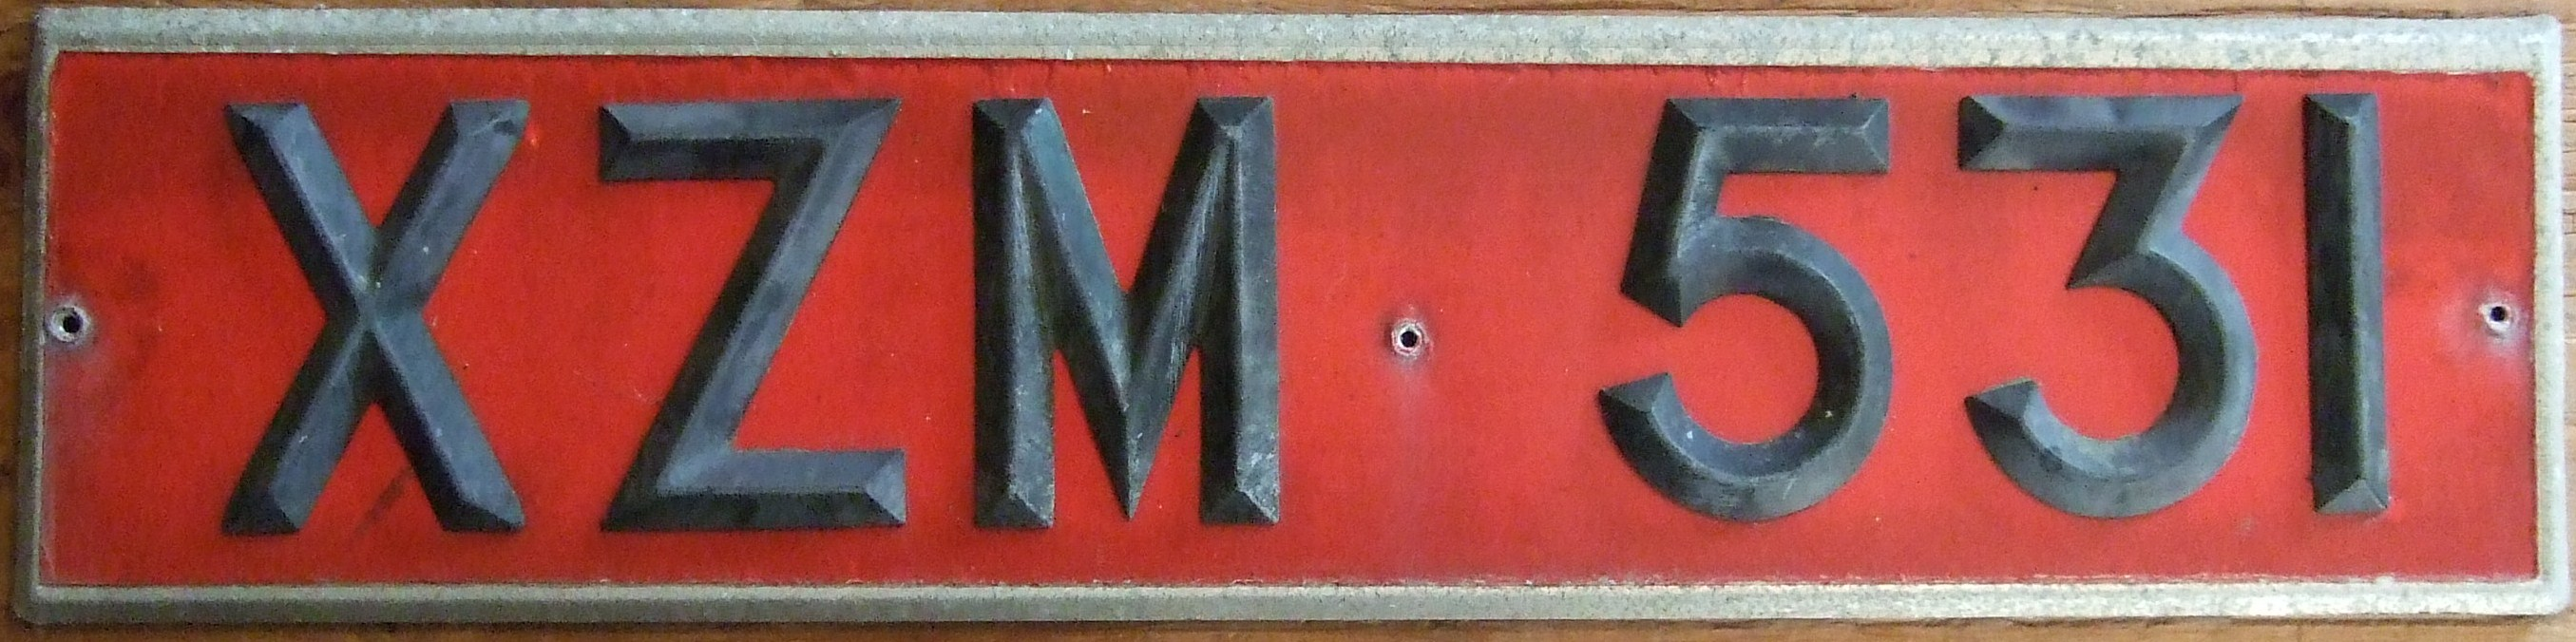 Fine Old Registration Plates Gift - Classic Cars Ideas - boiq.info